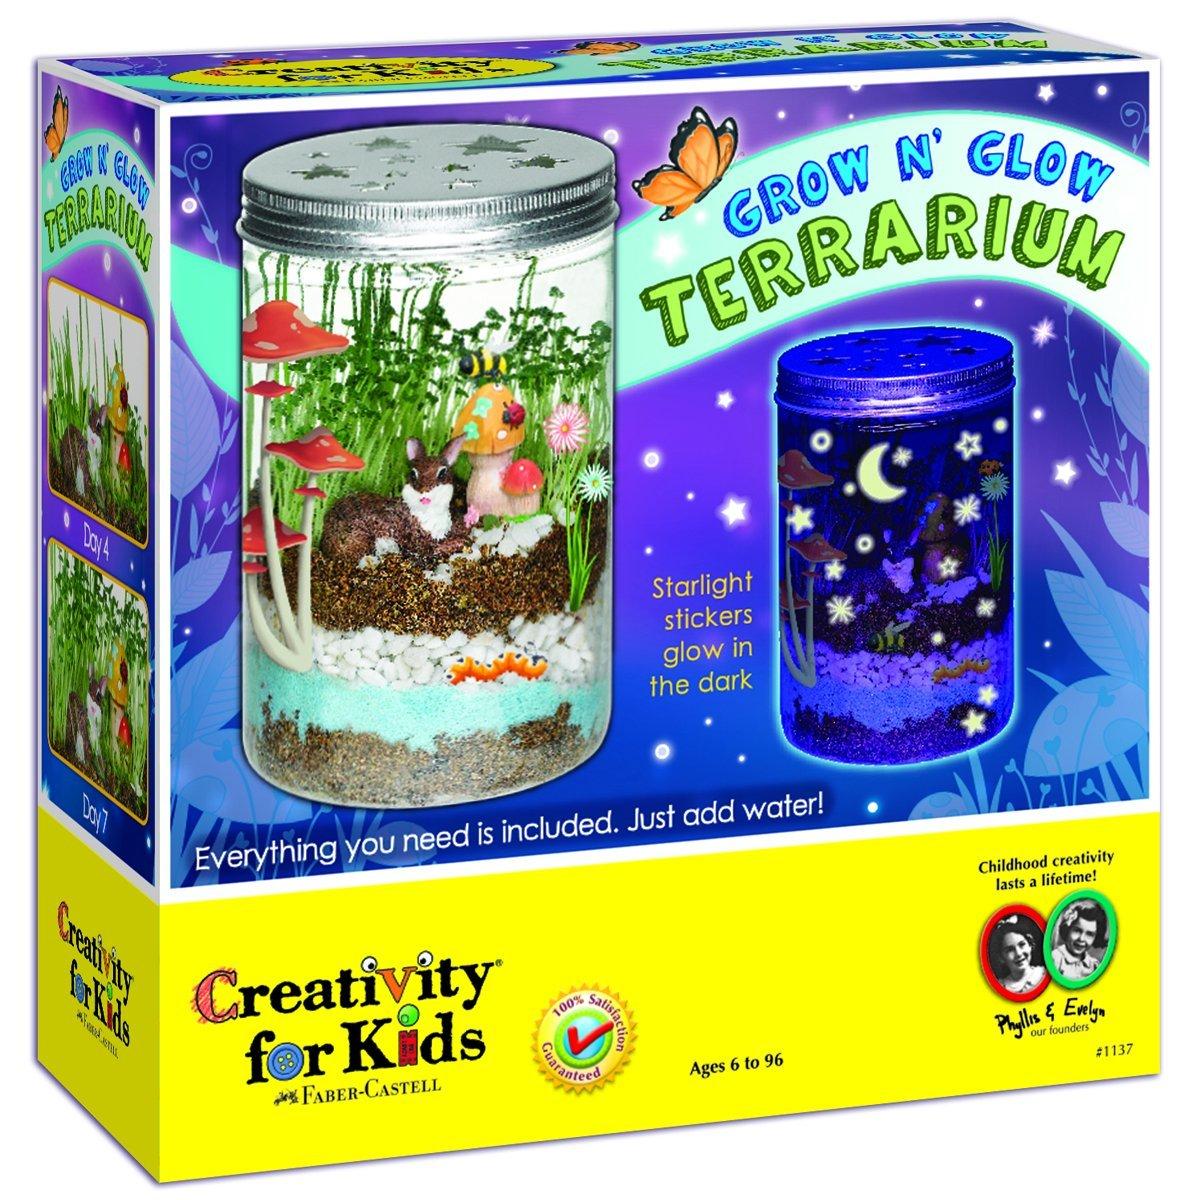 Creativity for kids grow  n glow terrarium 3